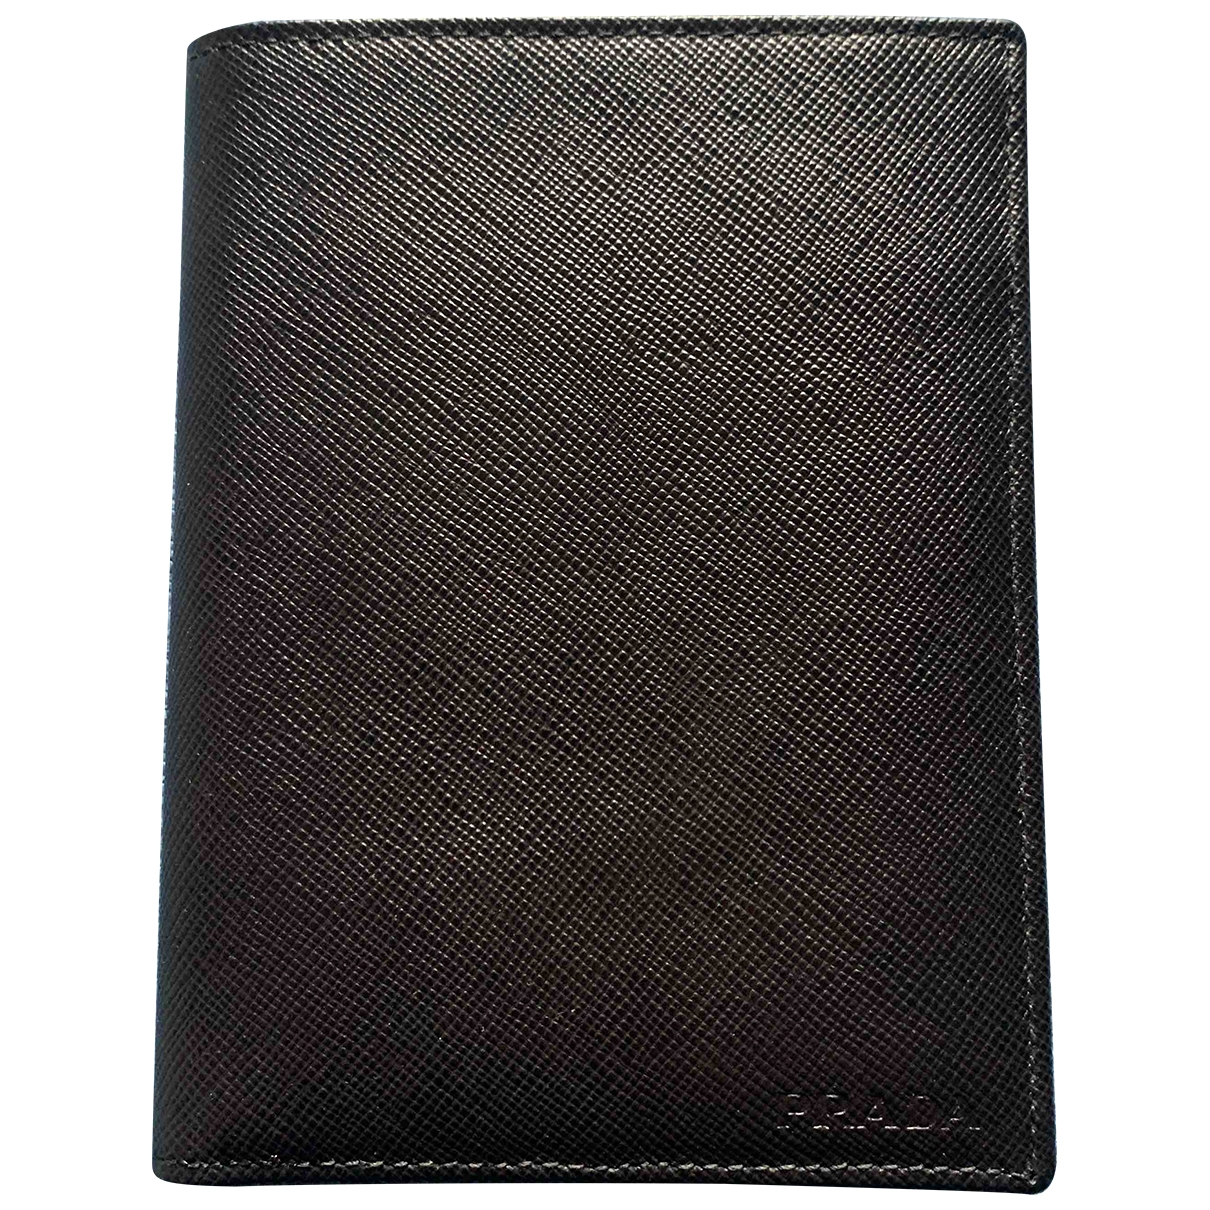 Prada \N Kleinlederwaren in  Schwarz Leder